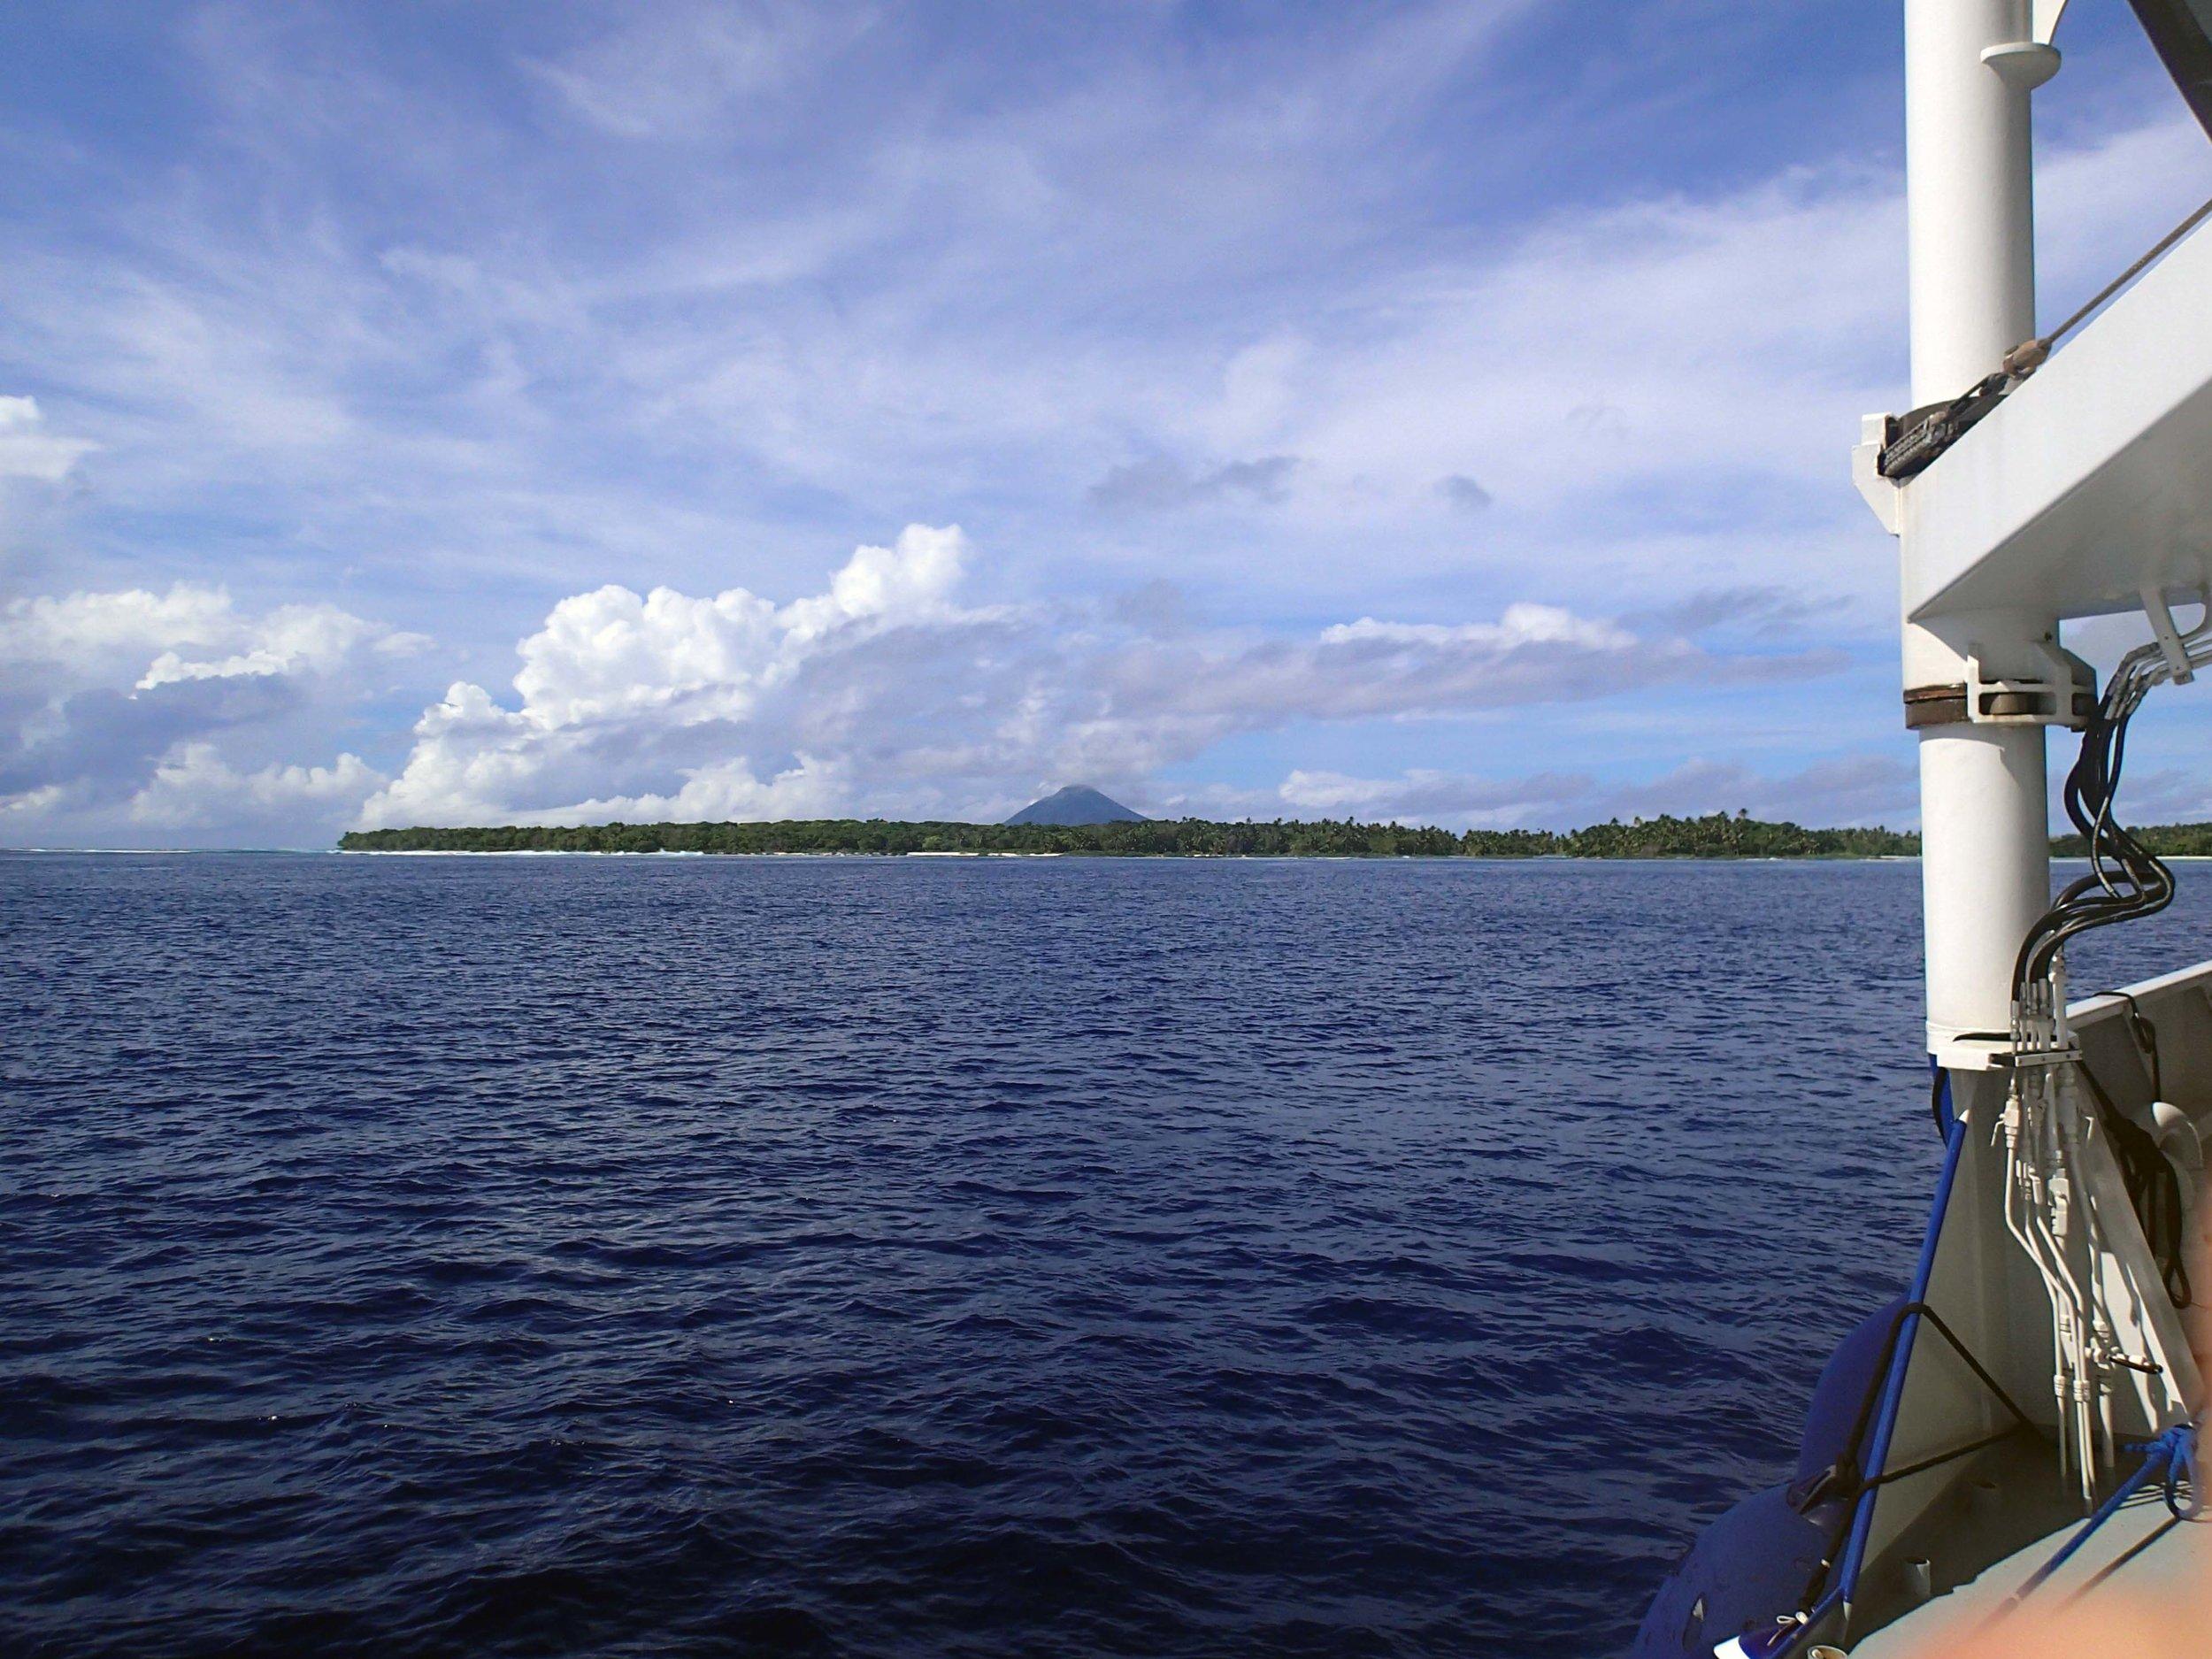 volcano near Niuatoputapu.jpg